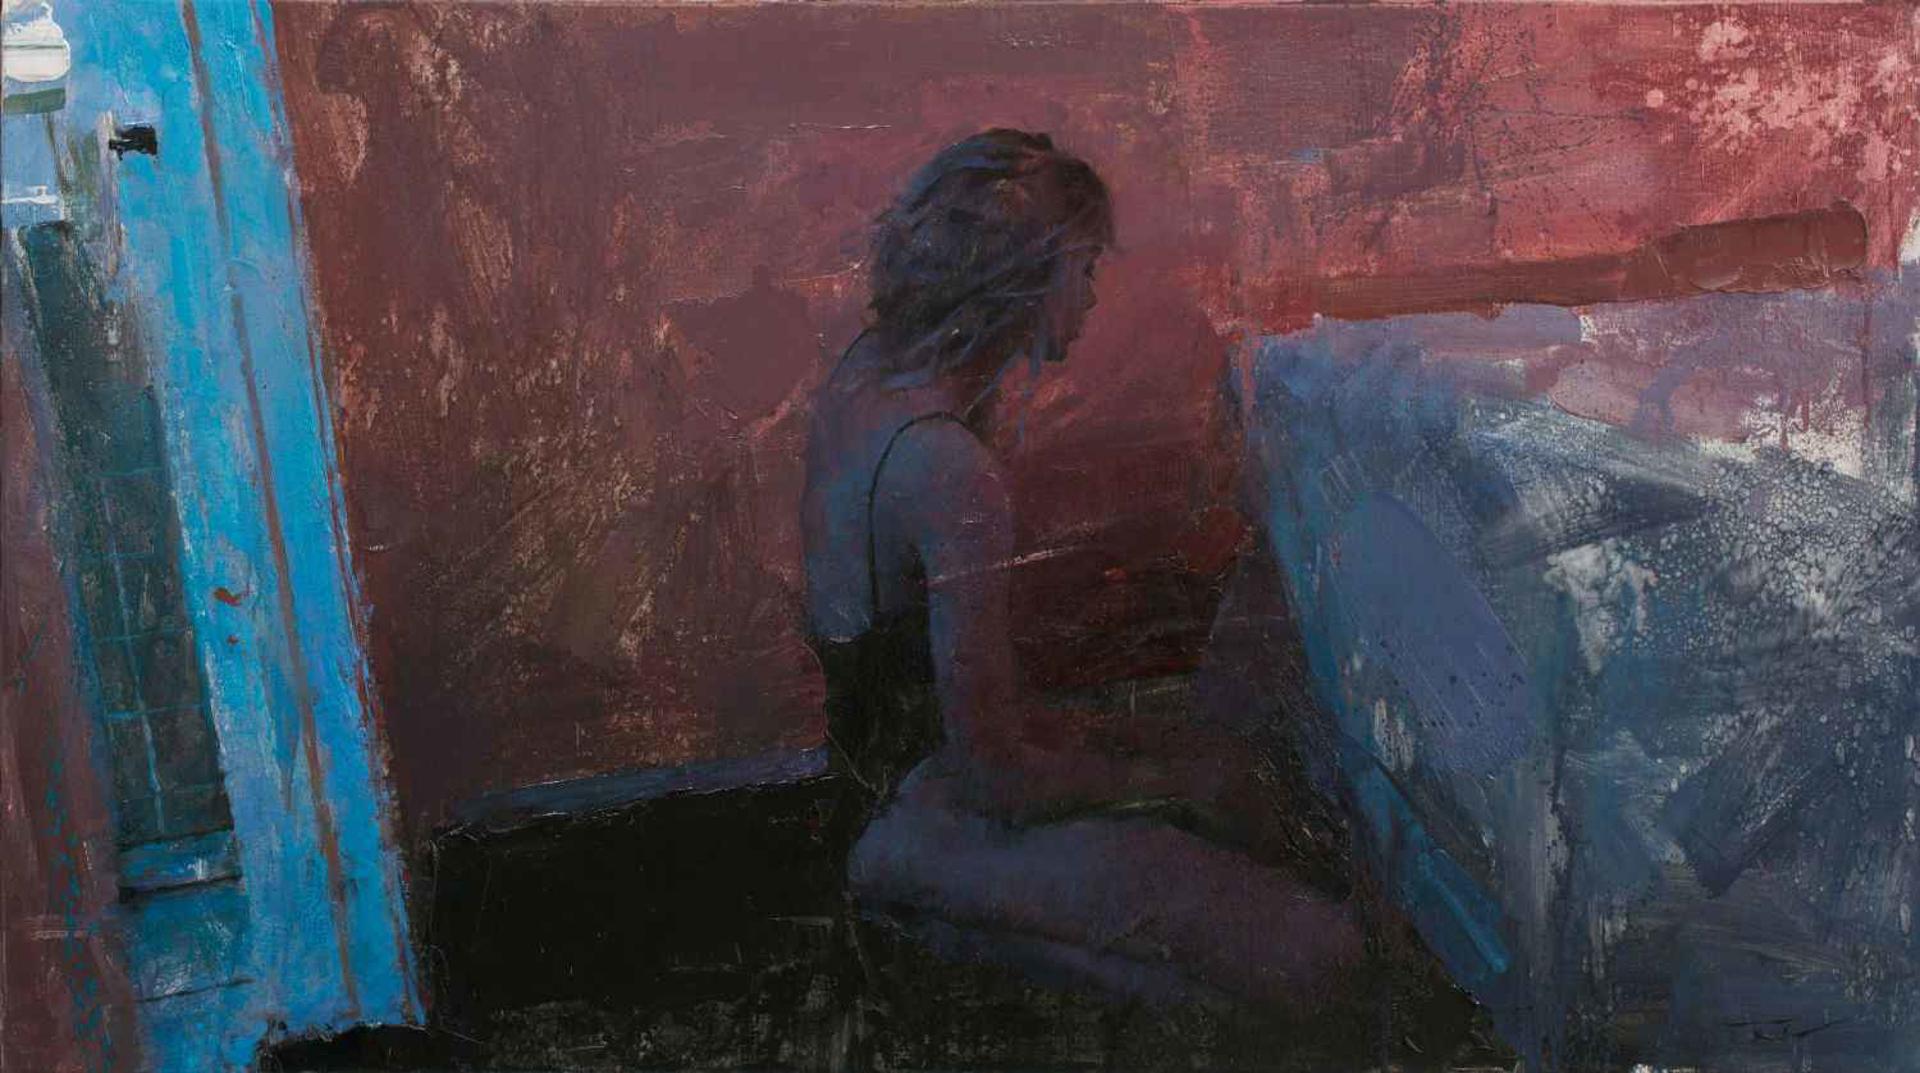 Room 6 by Casey Baugh